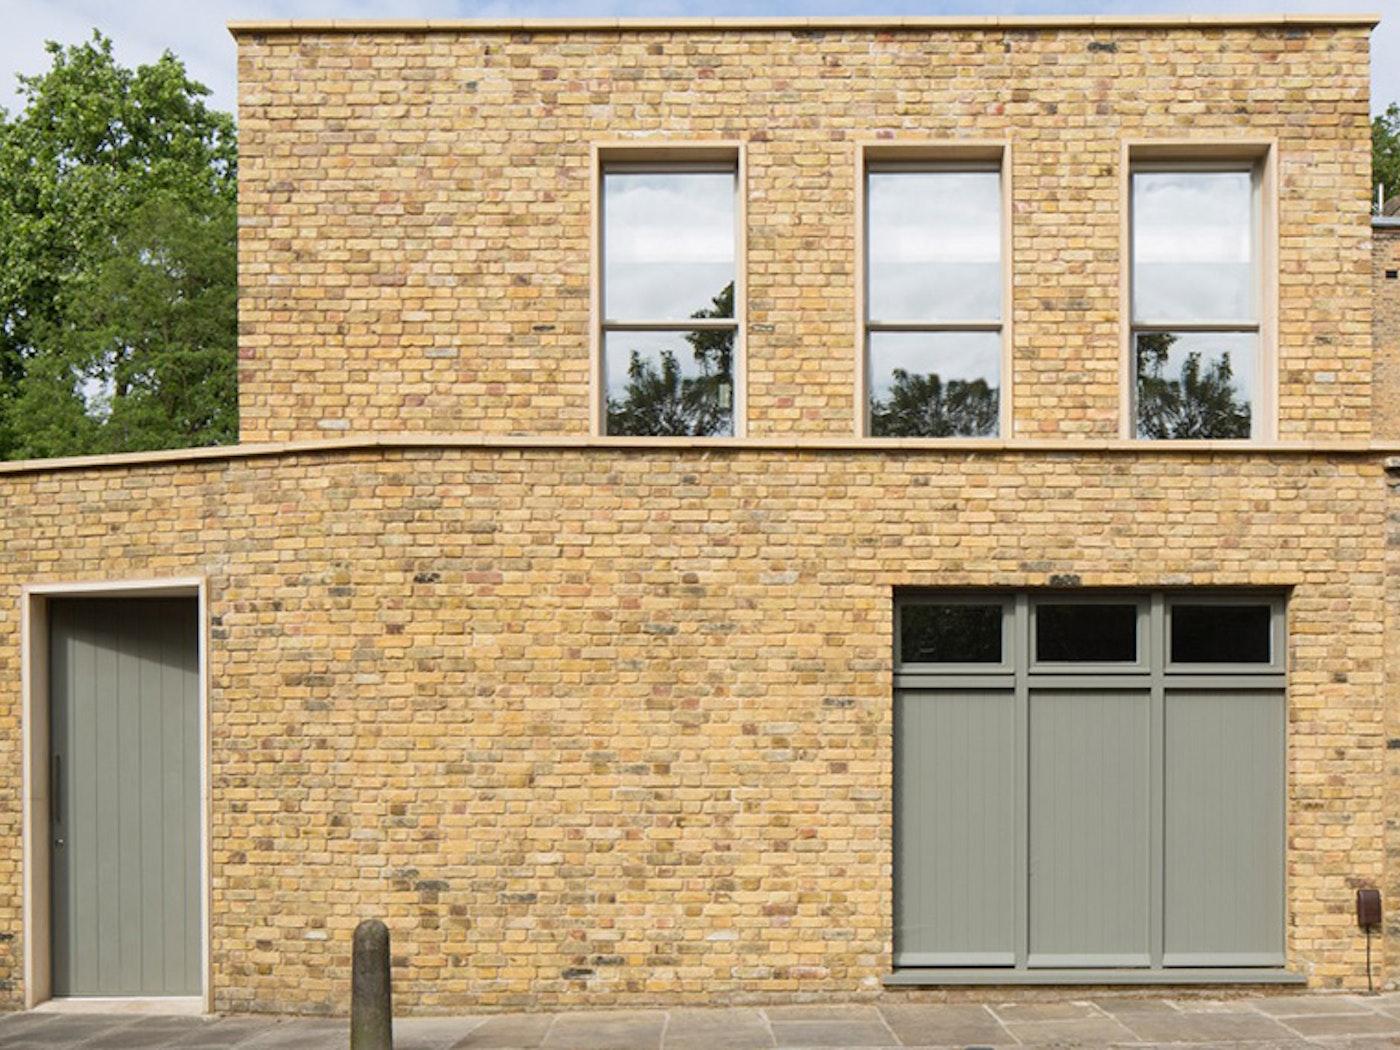 A sage green colour lifts the yellowish brick